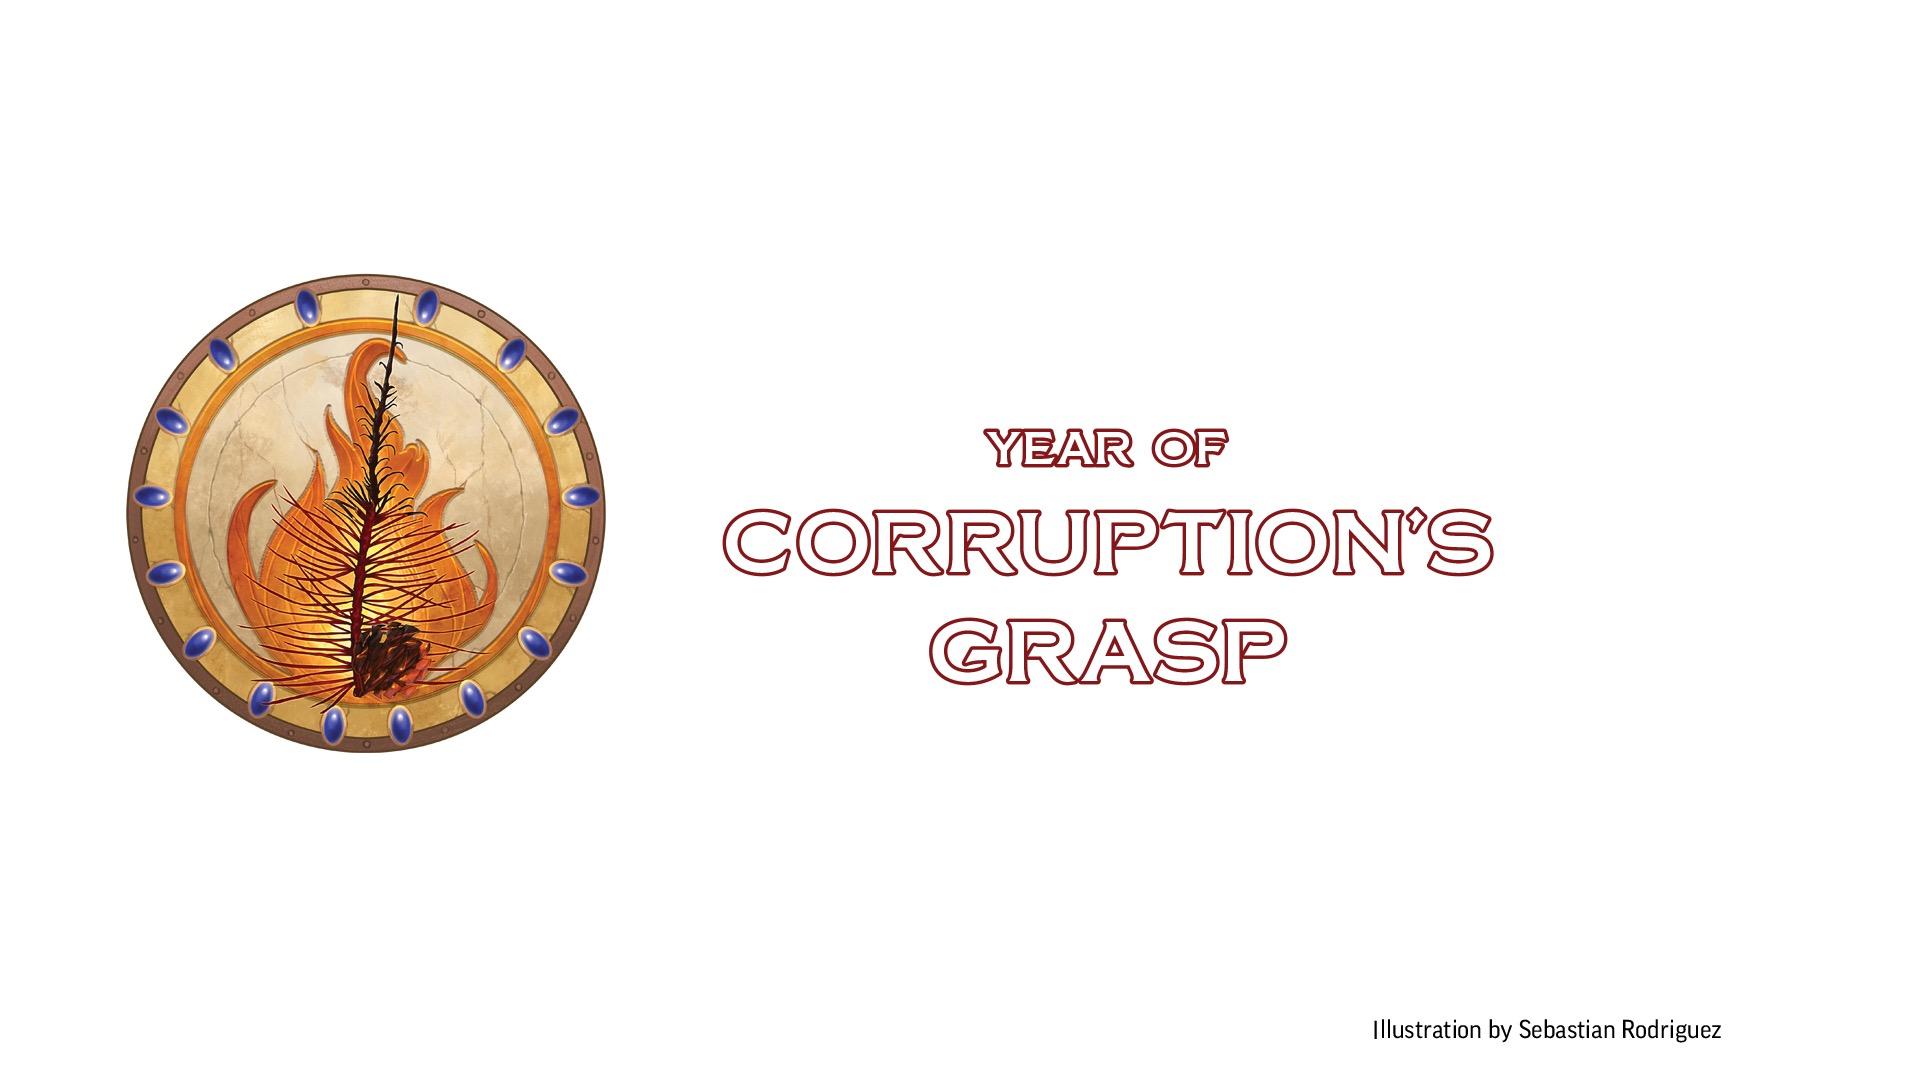 Pathfinder Society: Year of Corruption's Grasp Symbol